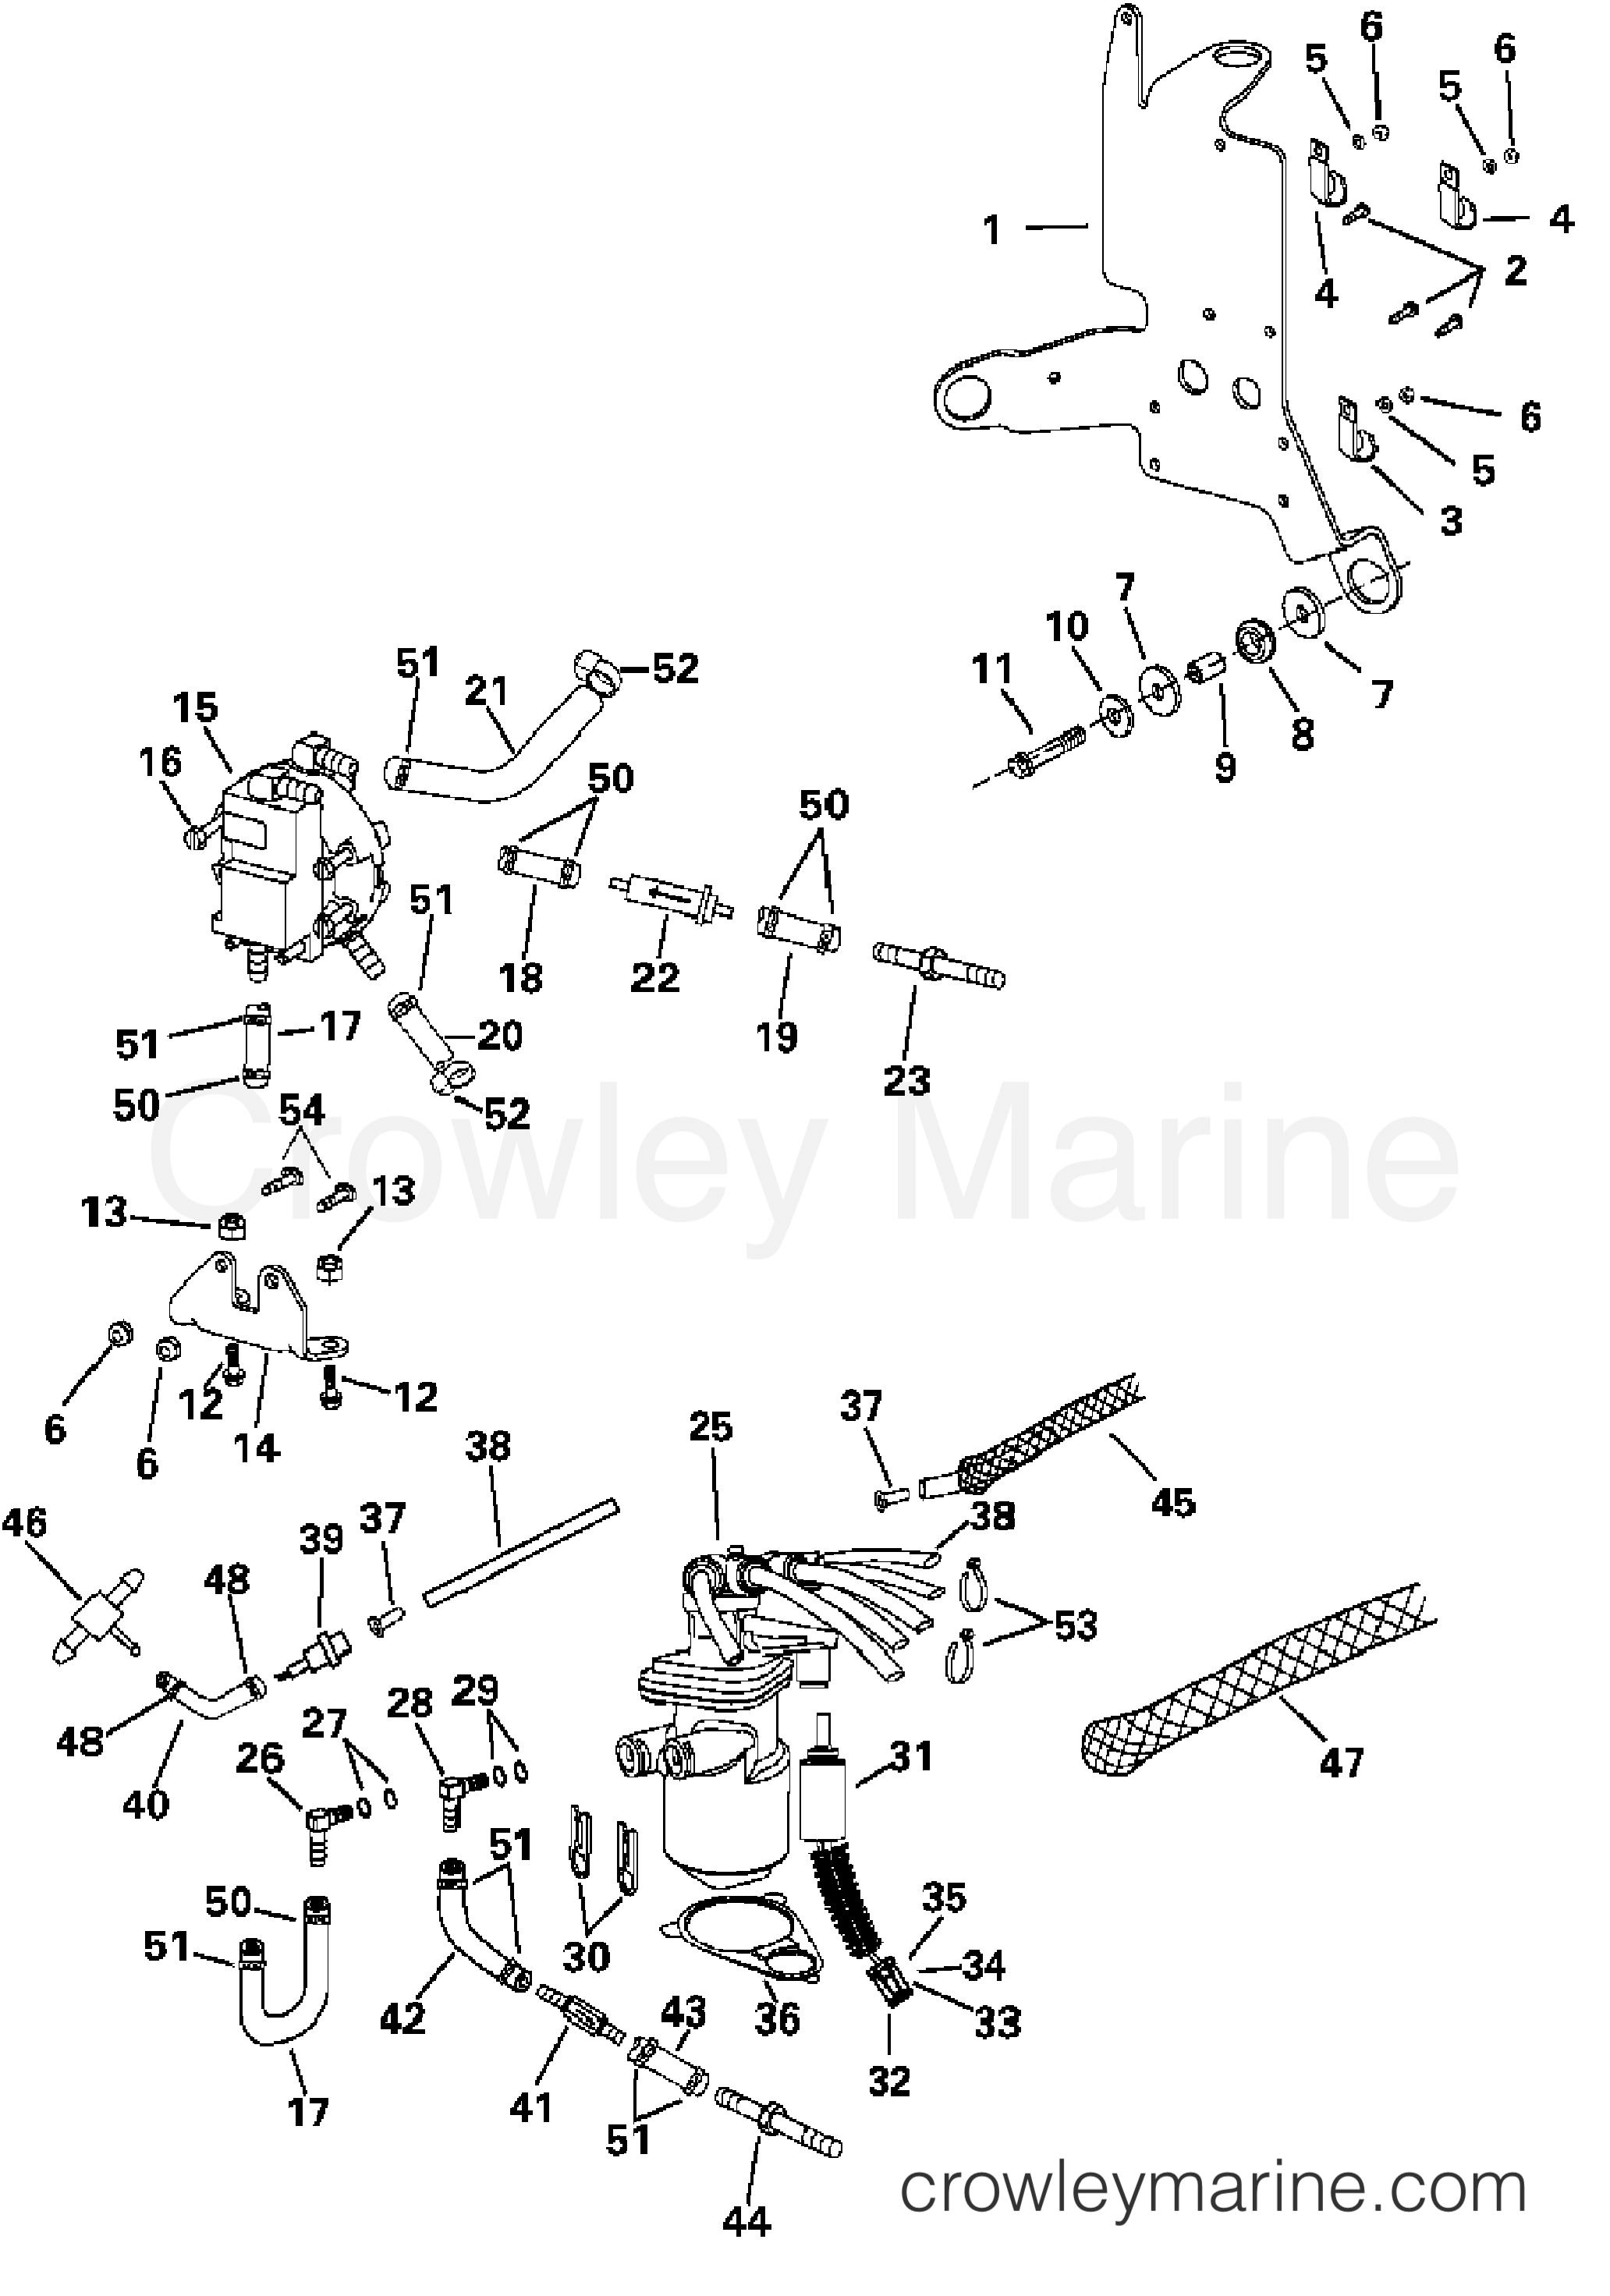 2004 Evinrude Outboards 200 - E200FCXSRB - OIL SYSTEM section